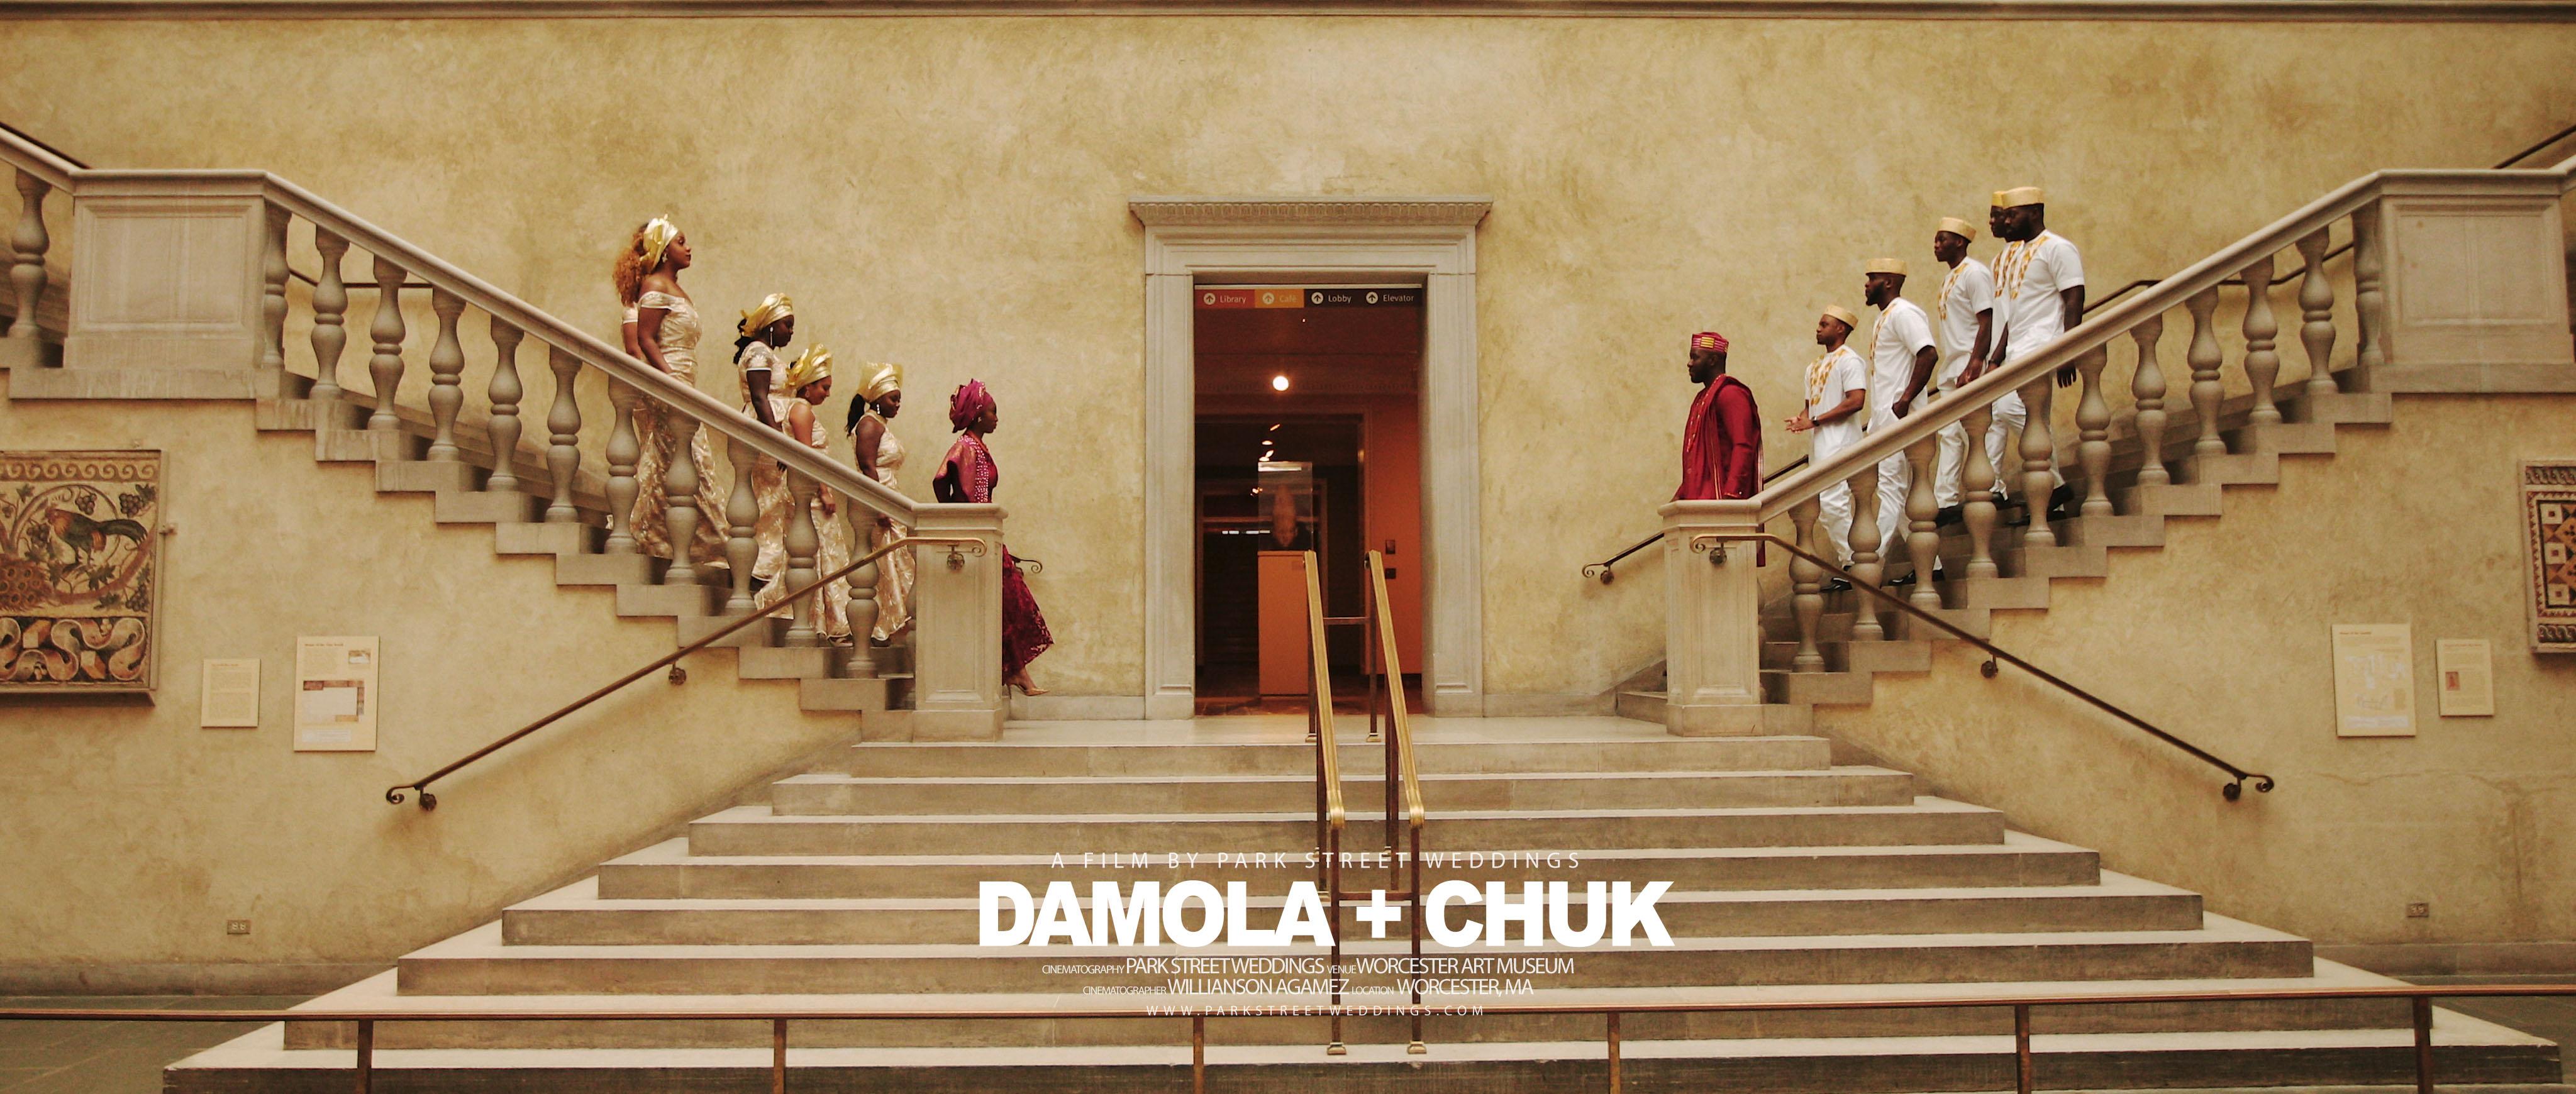 Damola + Chuk | Worcester, Massachusetts | Worcester Art Museum